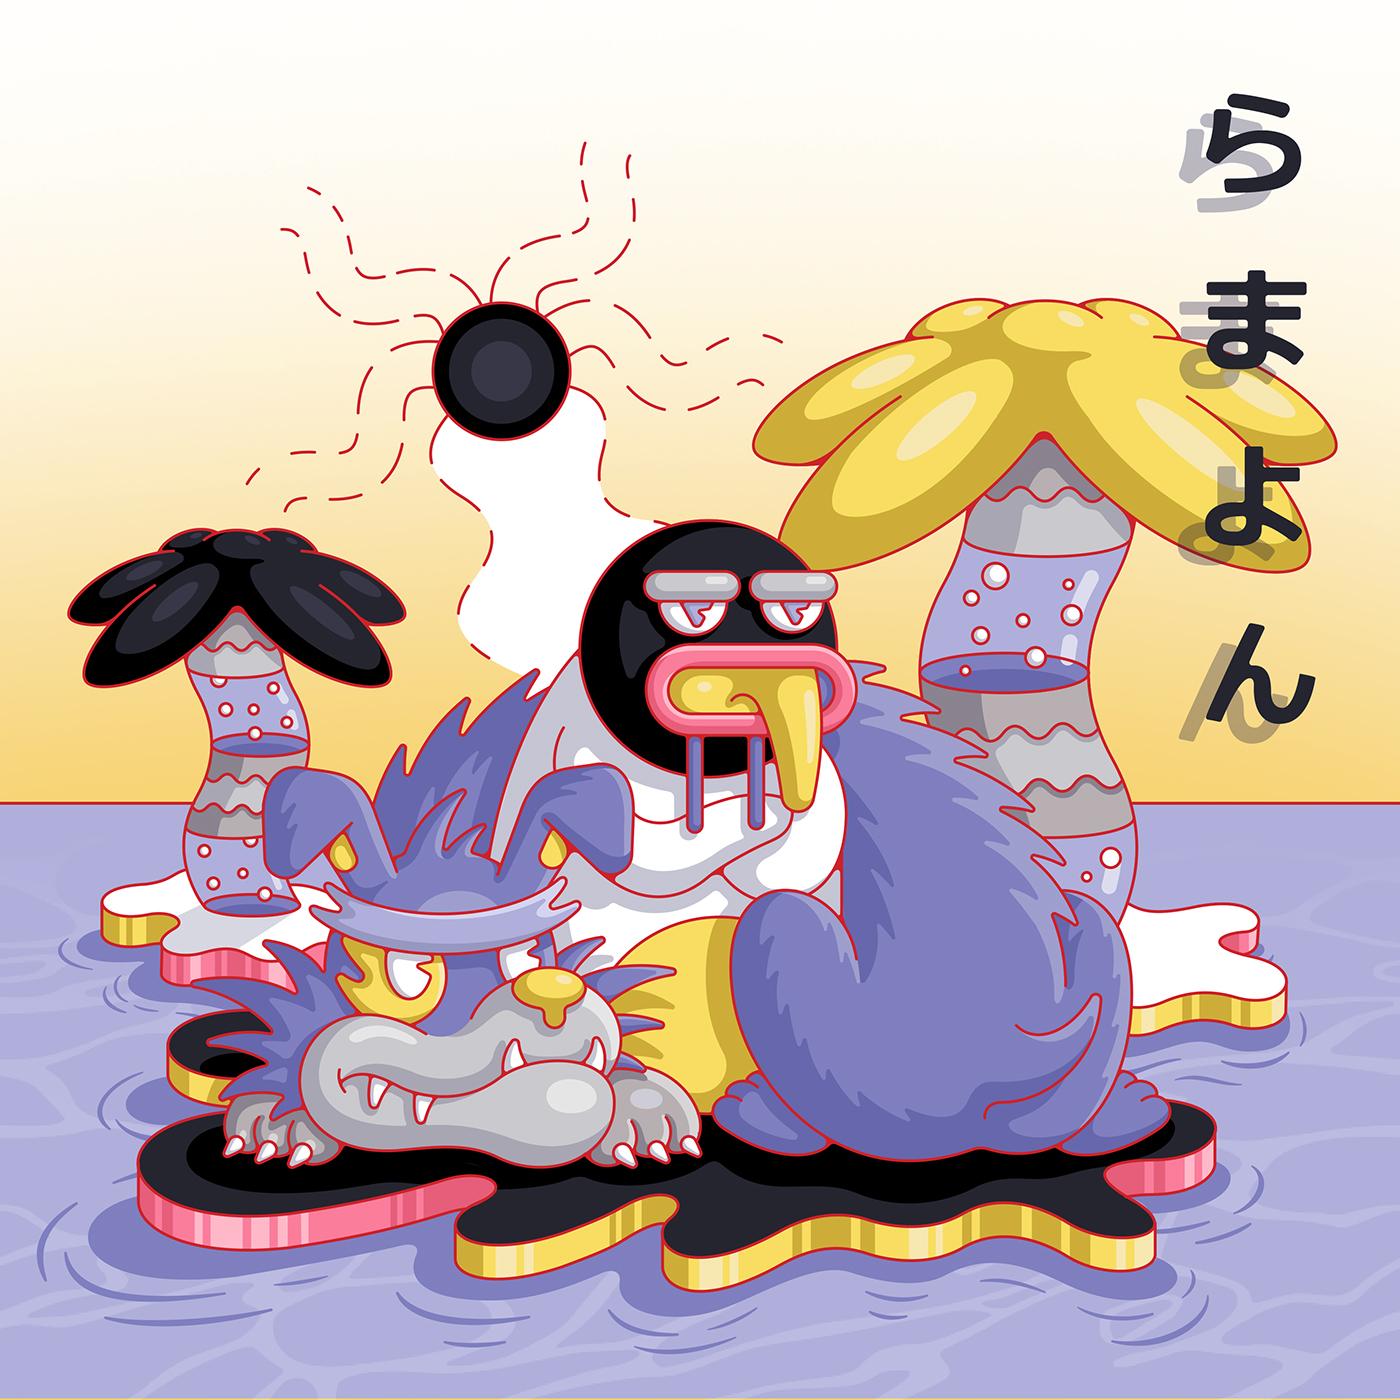 Pinguin melting heat Palm Tree dog floating Sunny cold gangster Island